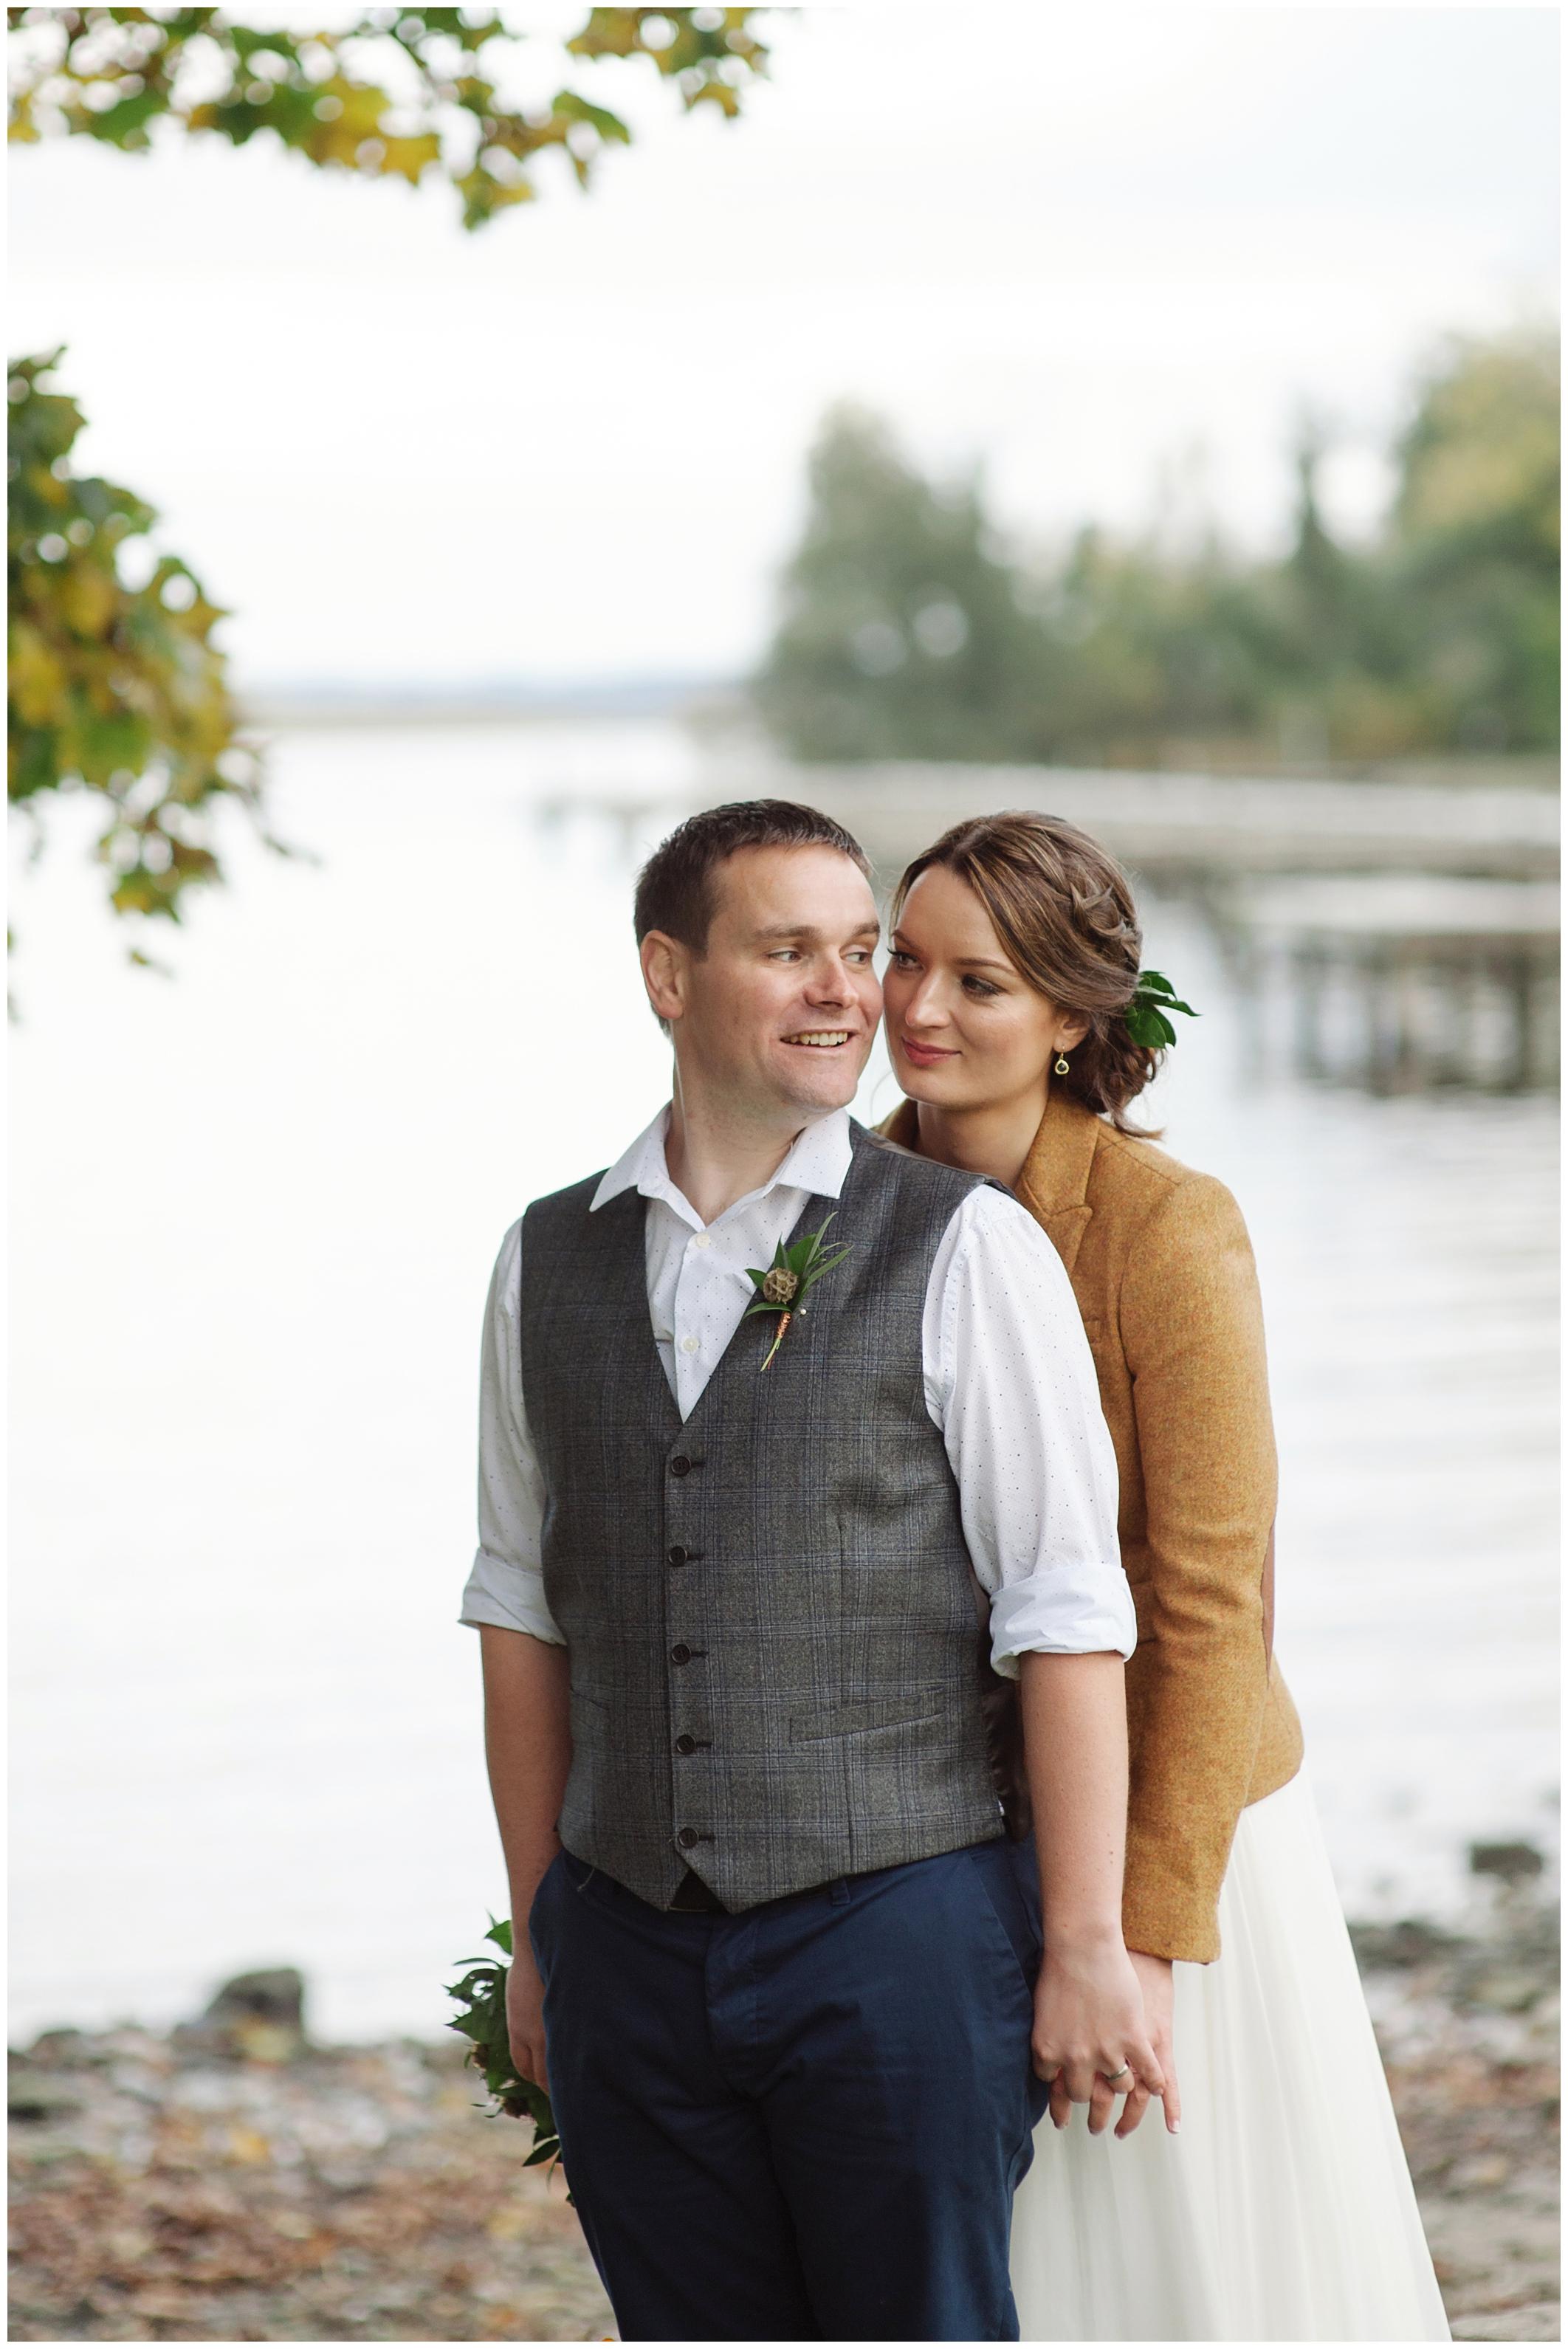 winter_wedding_jude_browne_photography_0005.jpg